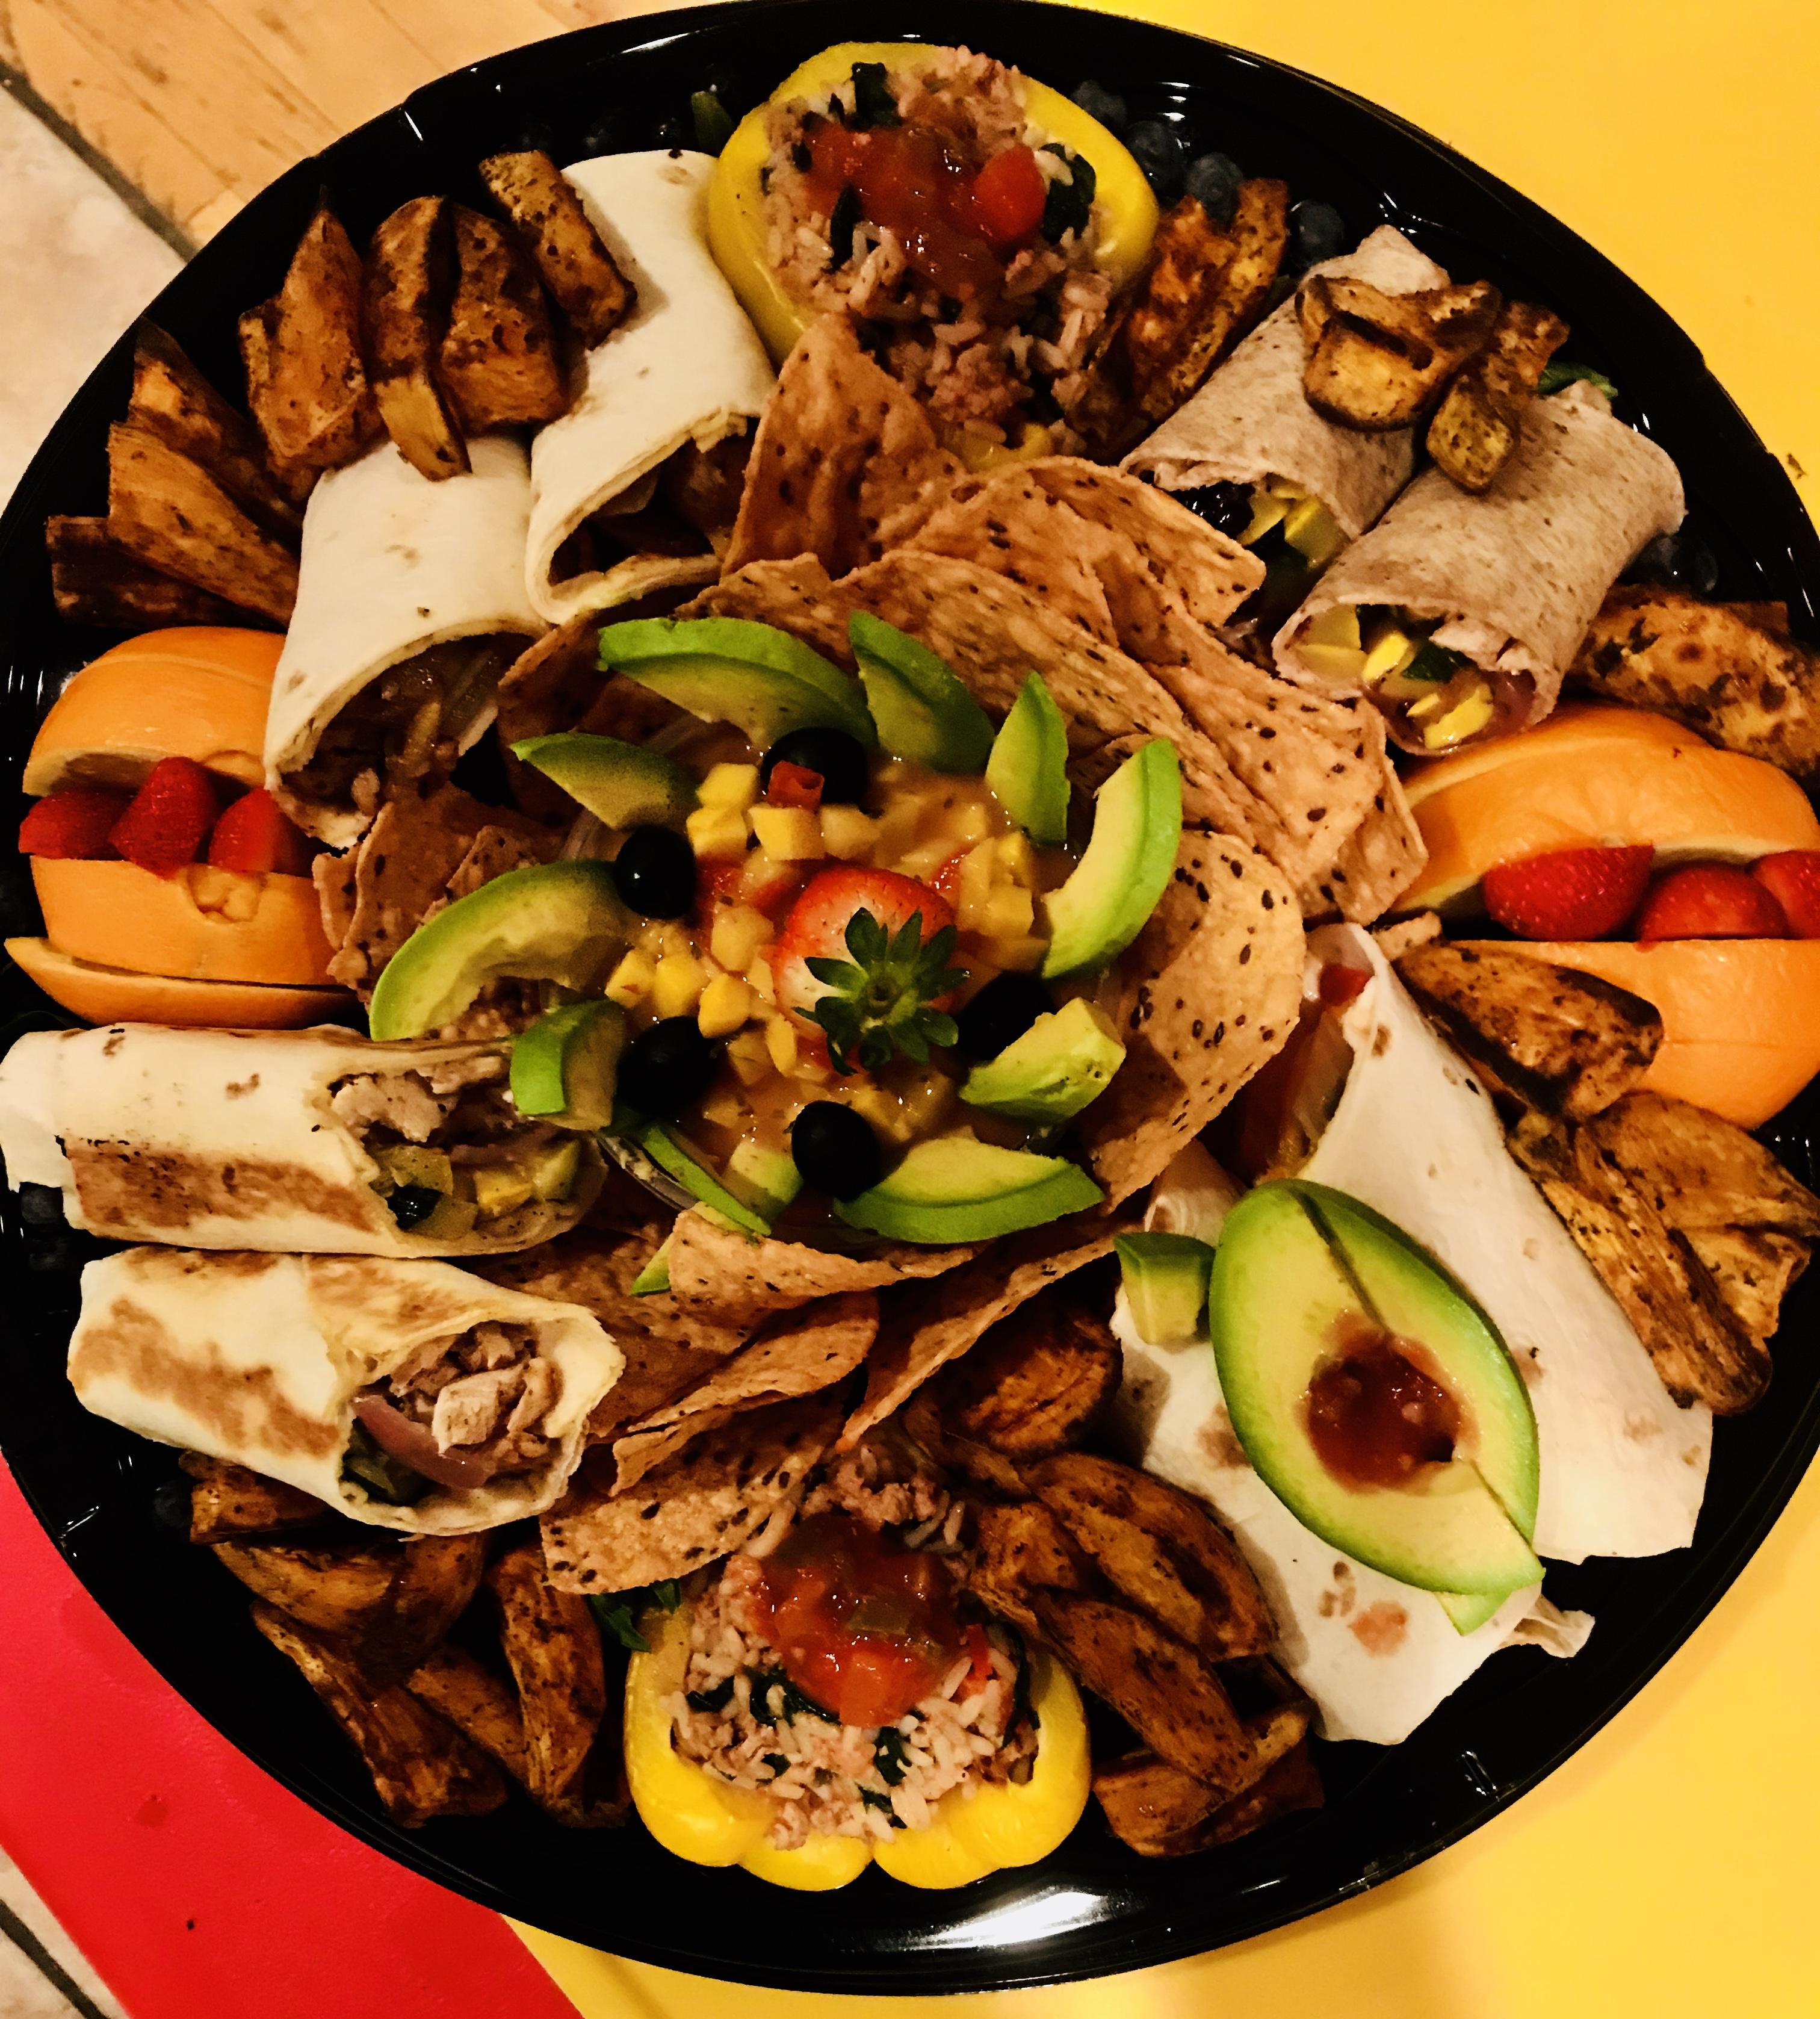 decorative organic sampler platter